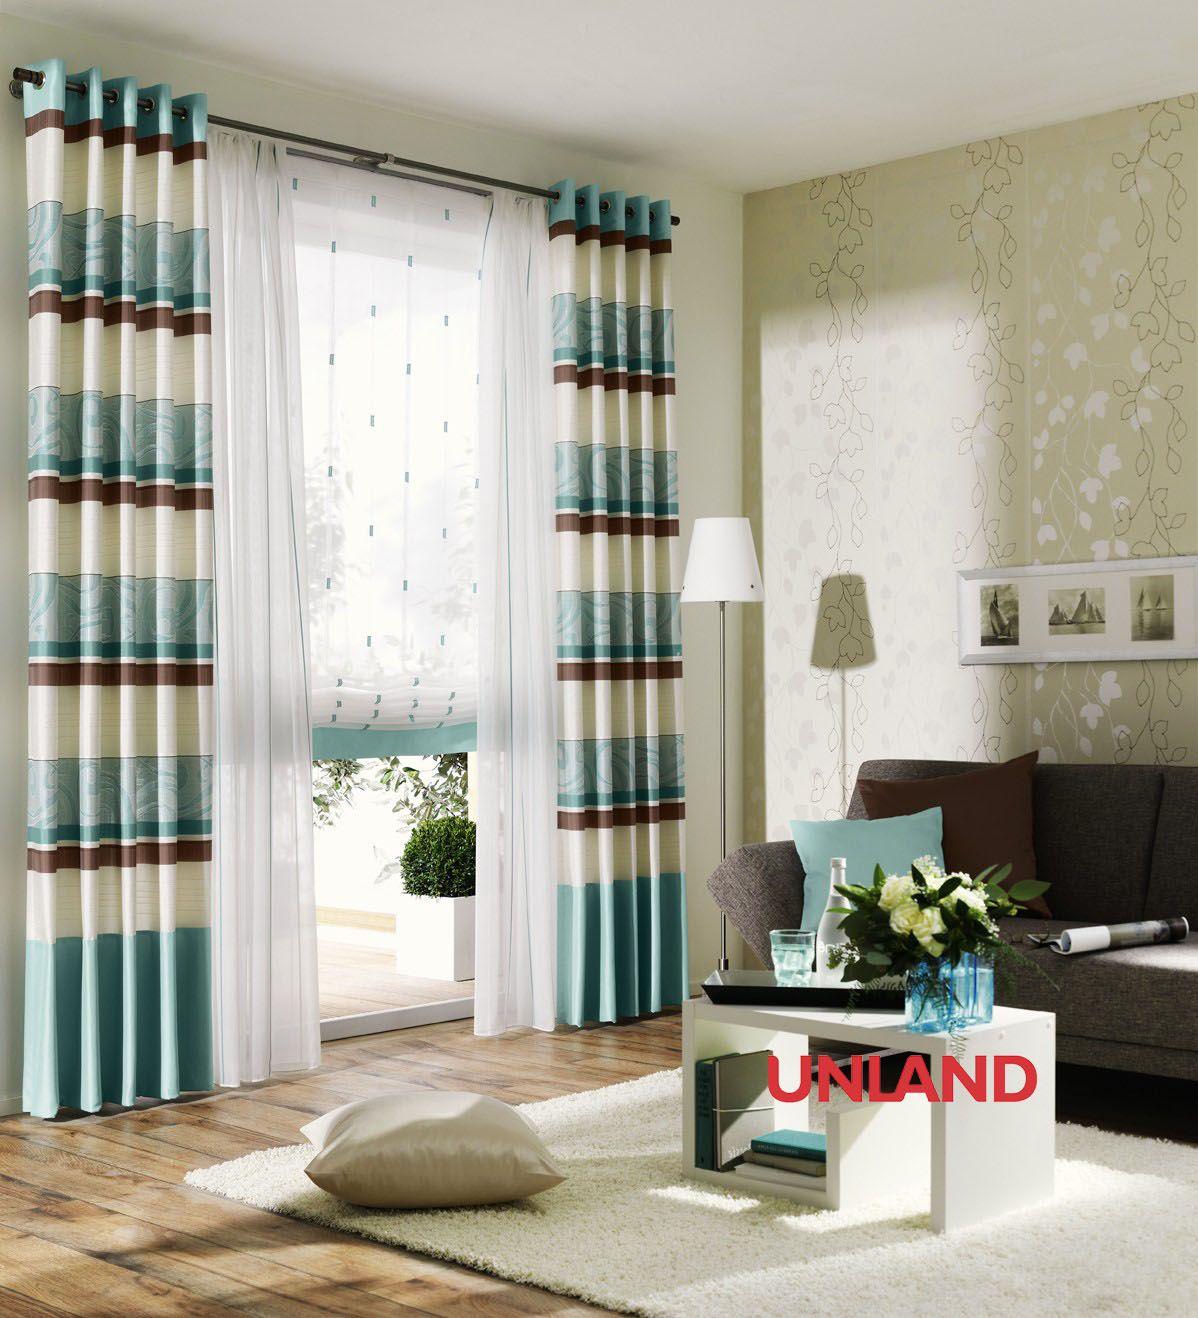 unland aqua fensterideen vorhang gardinen und sonnenschutz curtains contract fabrics. Black Bedroom Furniture Sets. Home Design Ideas